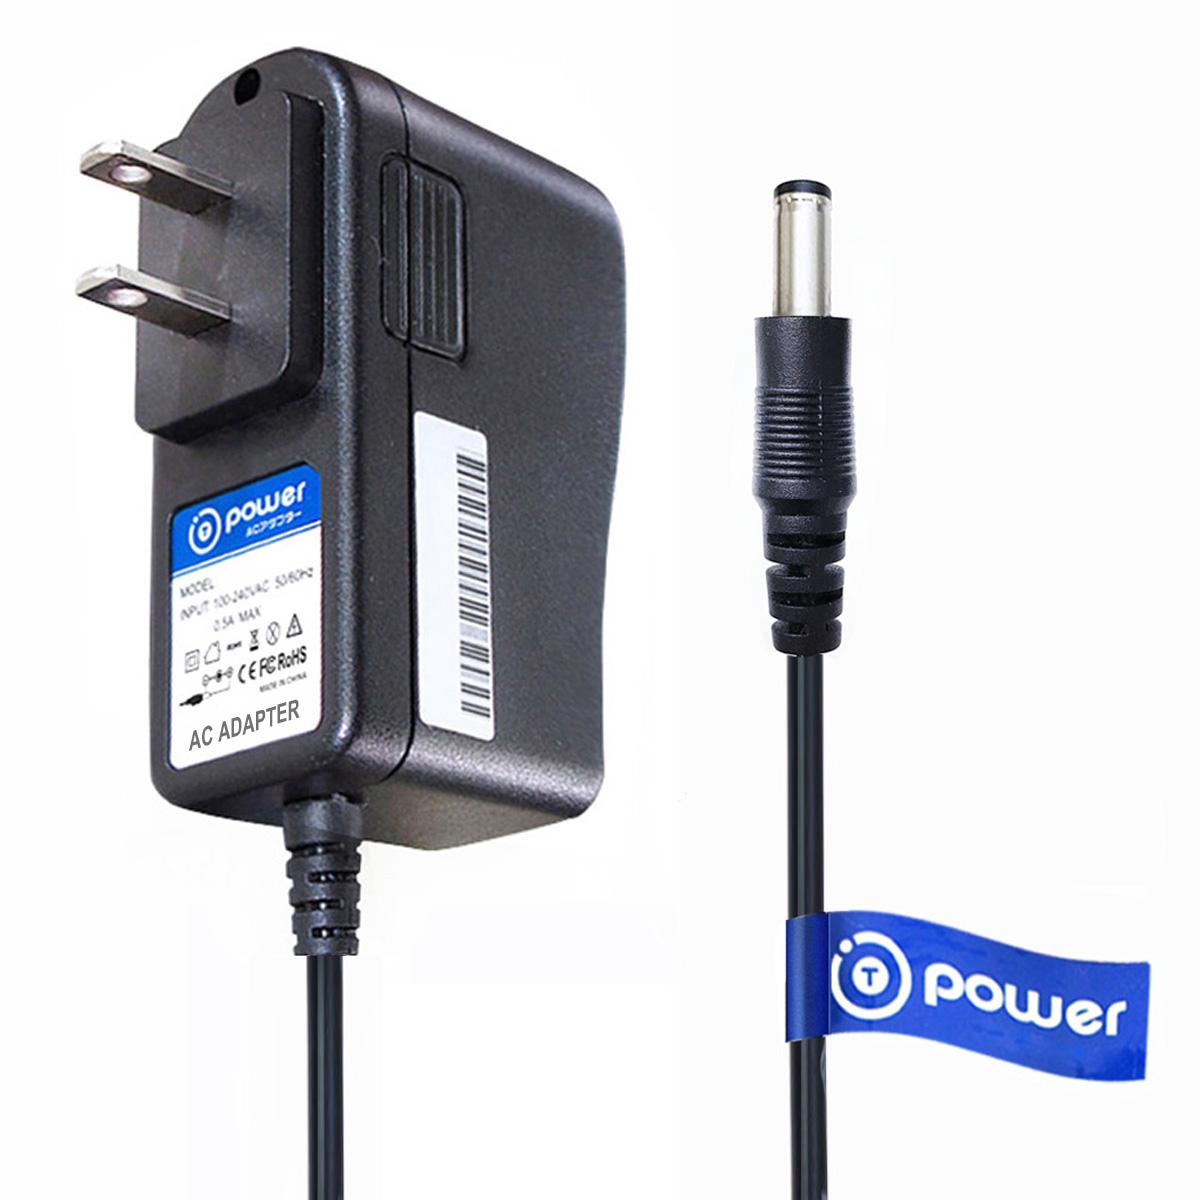 T-Power Ac adapter for Cyclops Sirius 250 500 , CYC-S250 CYC-X500H Lumen Handheld Spotlight w/6 LED Lights Charger Power supply